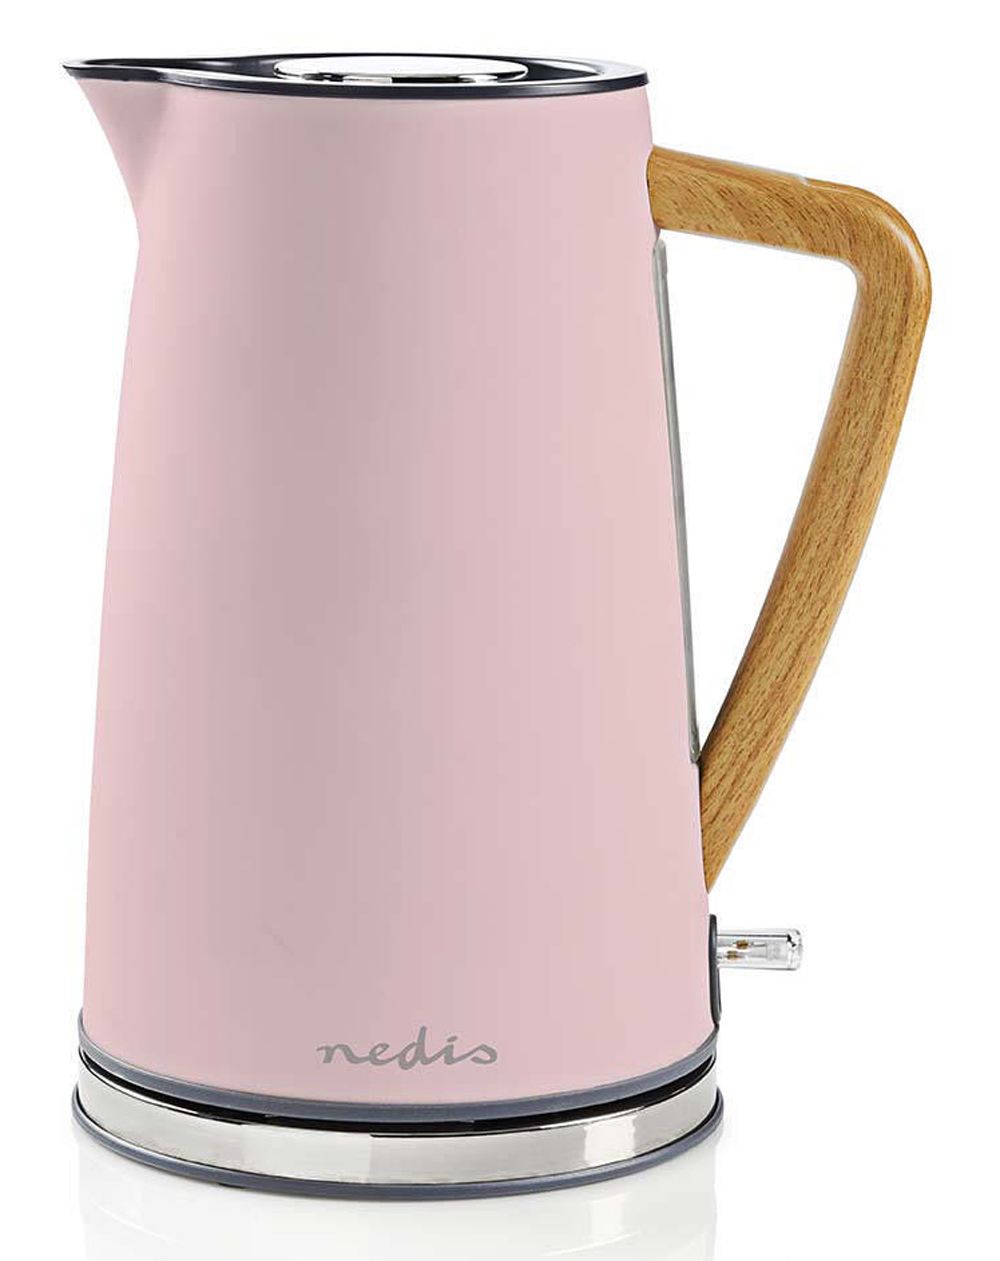 <h1>Nedis Soft-Touch-Wasserkocher KAWK510</h1><h3 style='font-size: 20px; margin: 0px 0px 15px 0px;'> -1,7 Liter Fassungsvermögen, Soft-Touch-Oberfläche</h3>